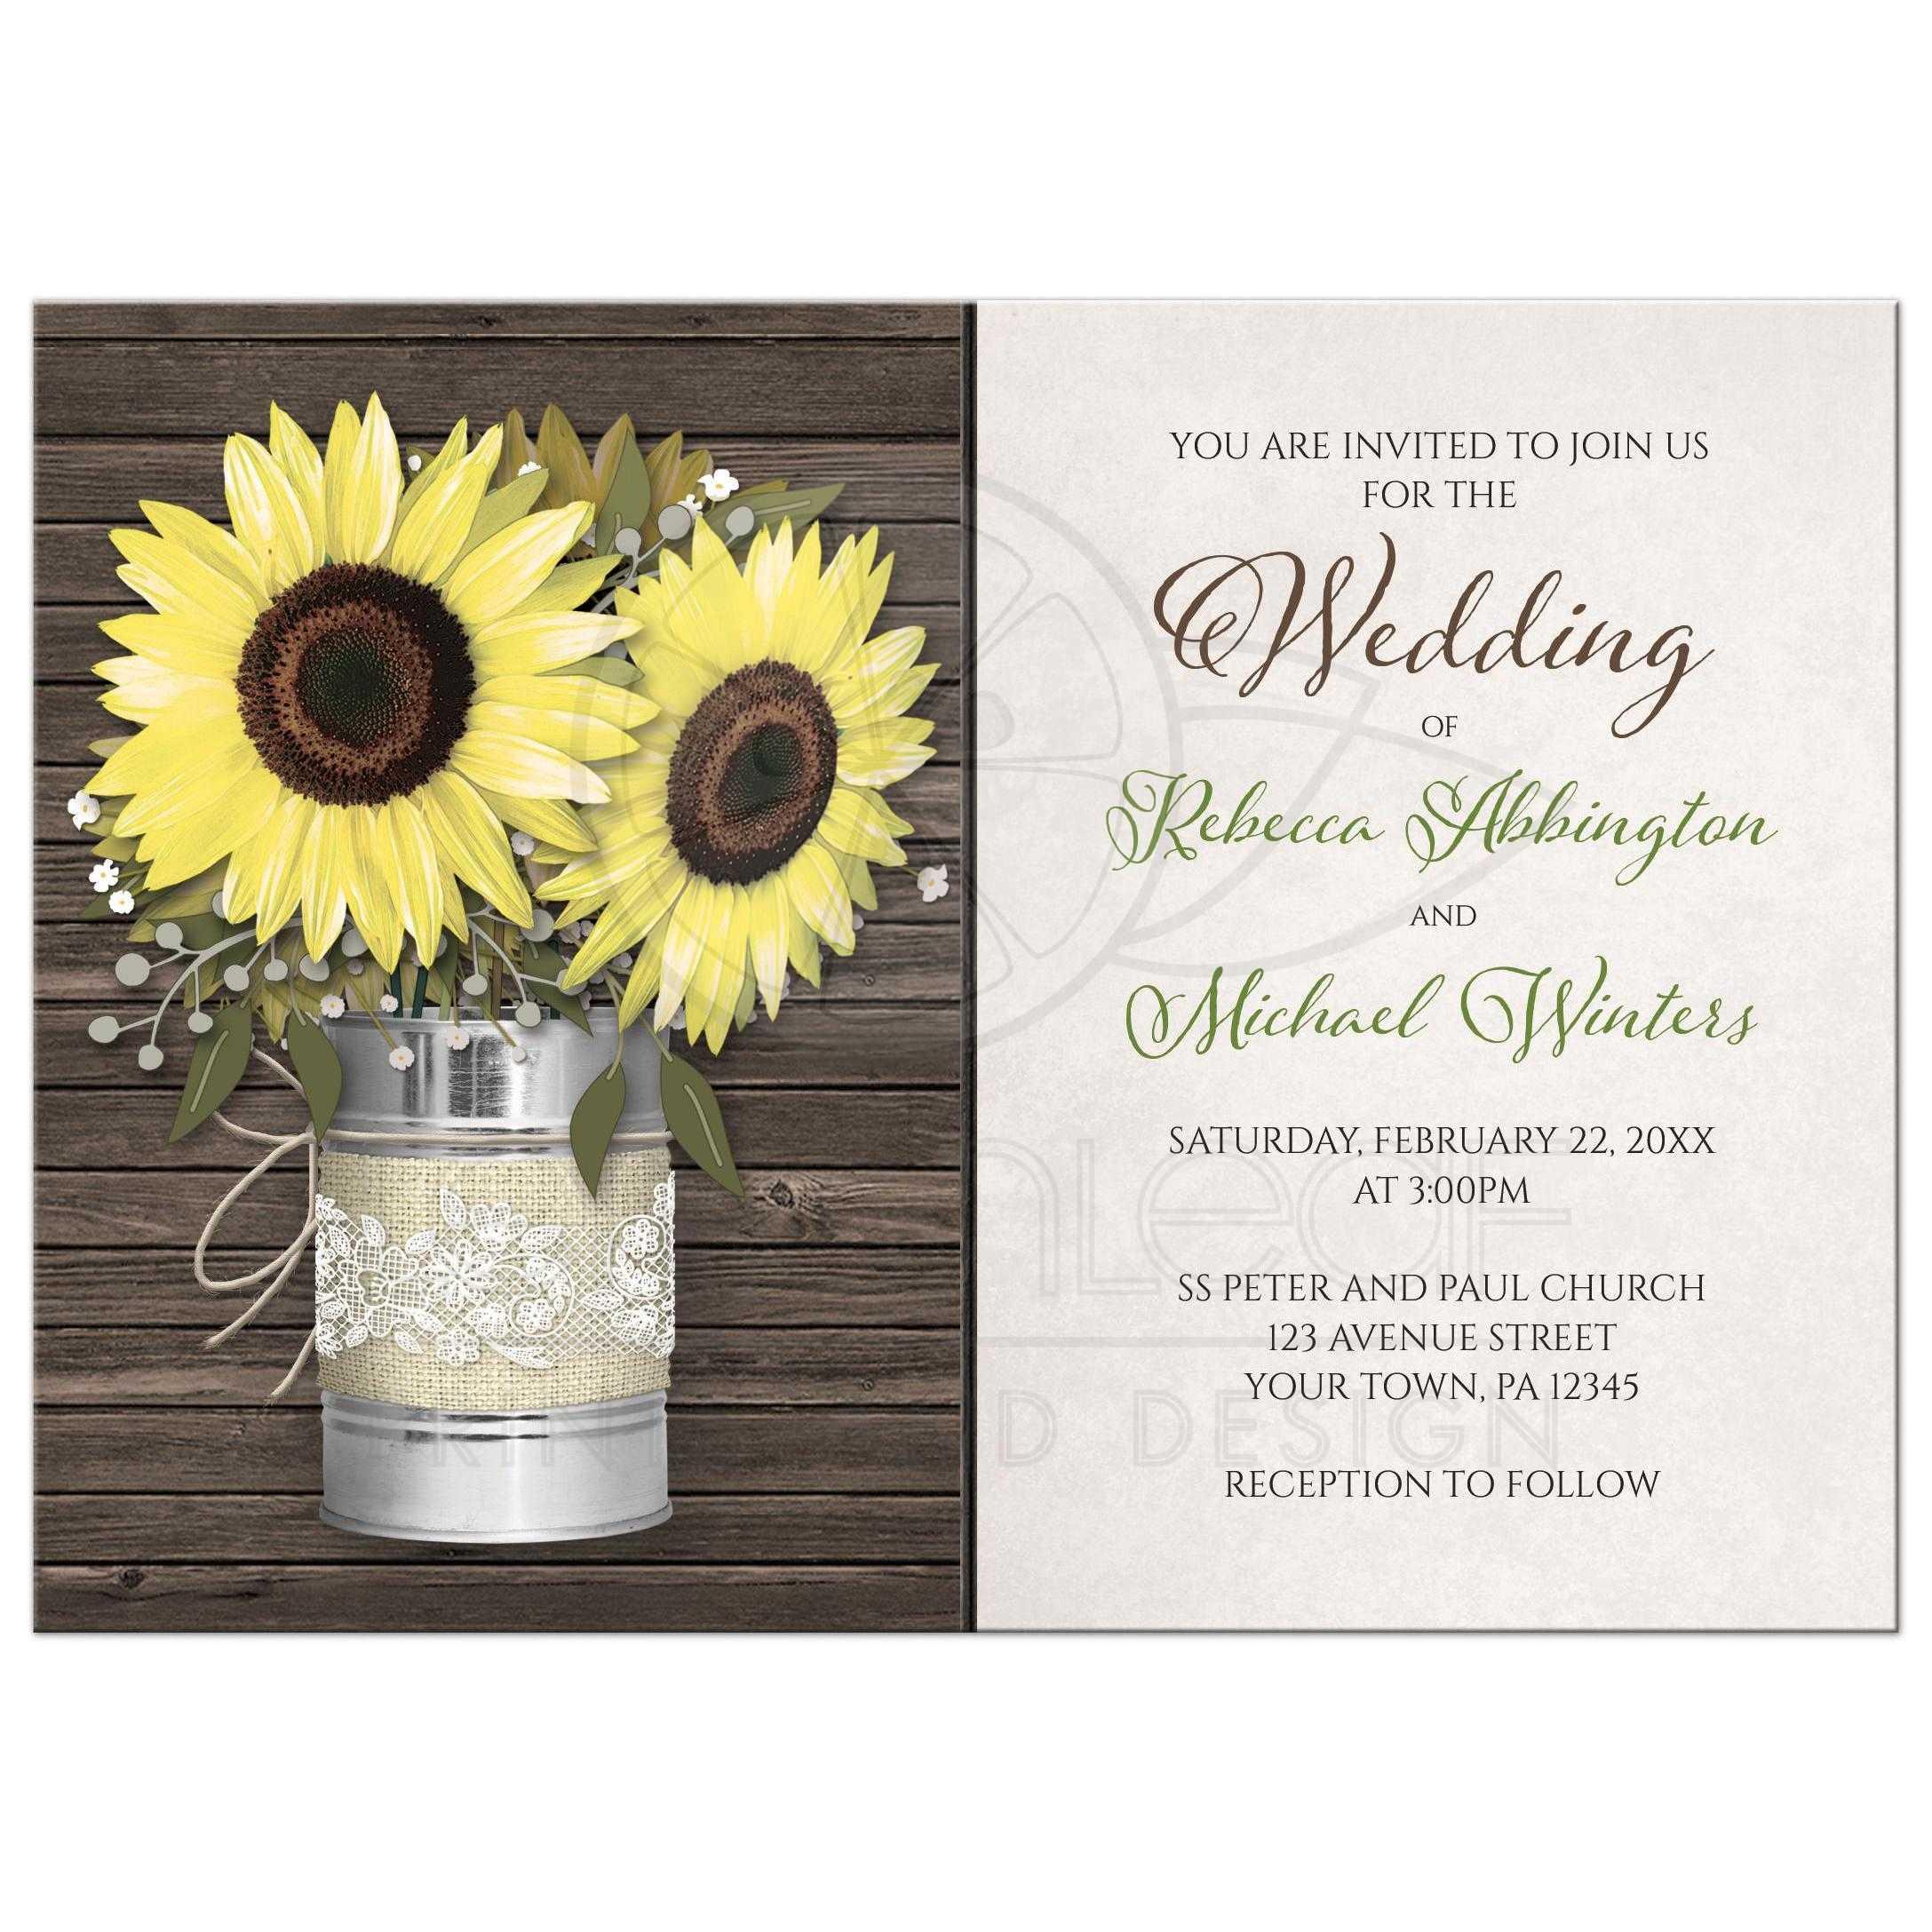 Wedding Invitations - Rustic Burlap & Lace Tin Can Sunflower